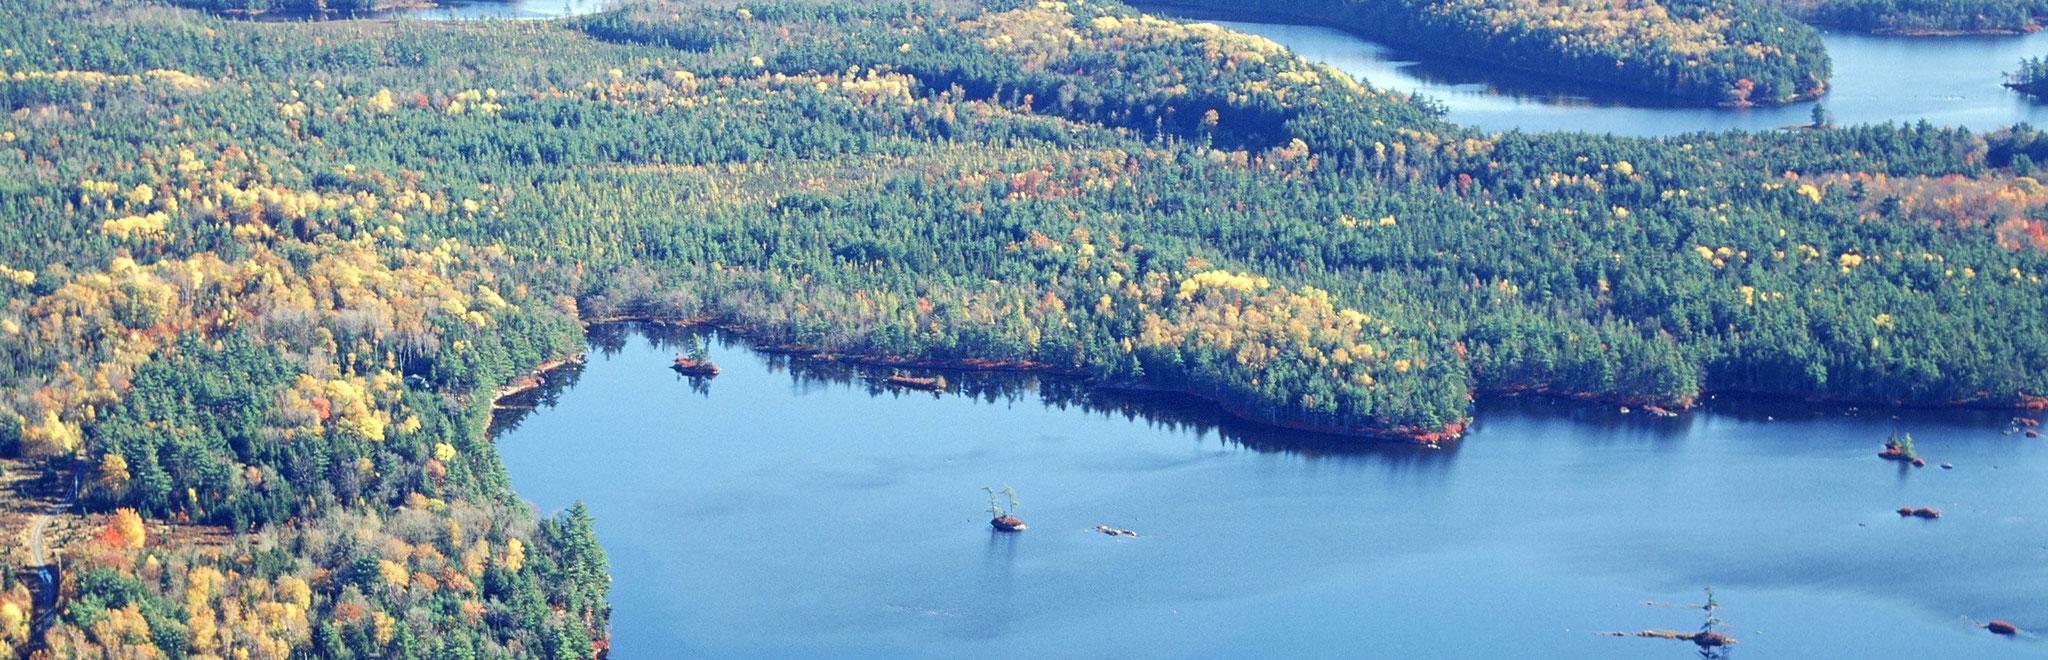 title:Russell Lake,title2:See-Grundstück,provinz:Nova Scotia,bezirk:Queens,art:Ferienimmobilie,flaeche:8.306 m²,ufer:55 Meter,preis:C$ 42.900